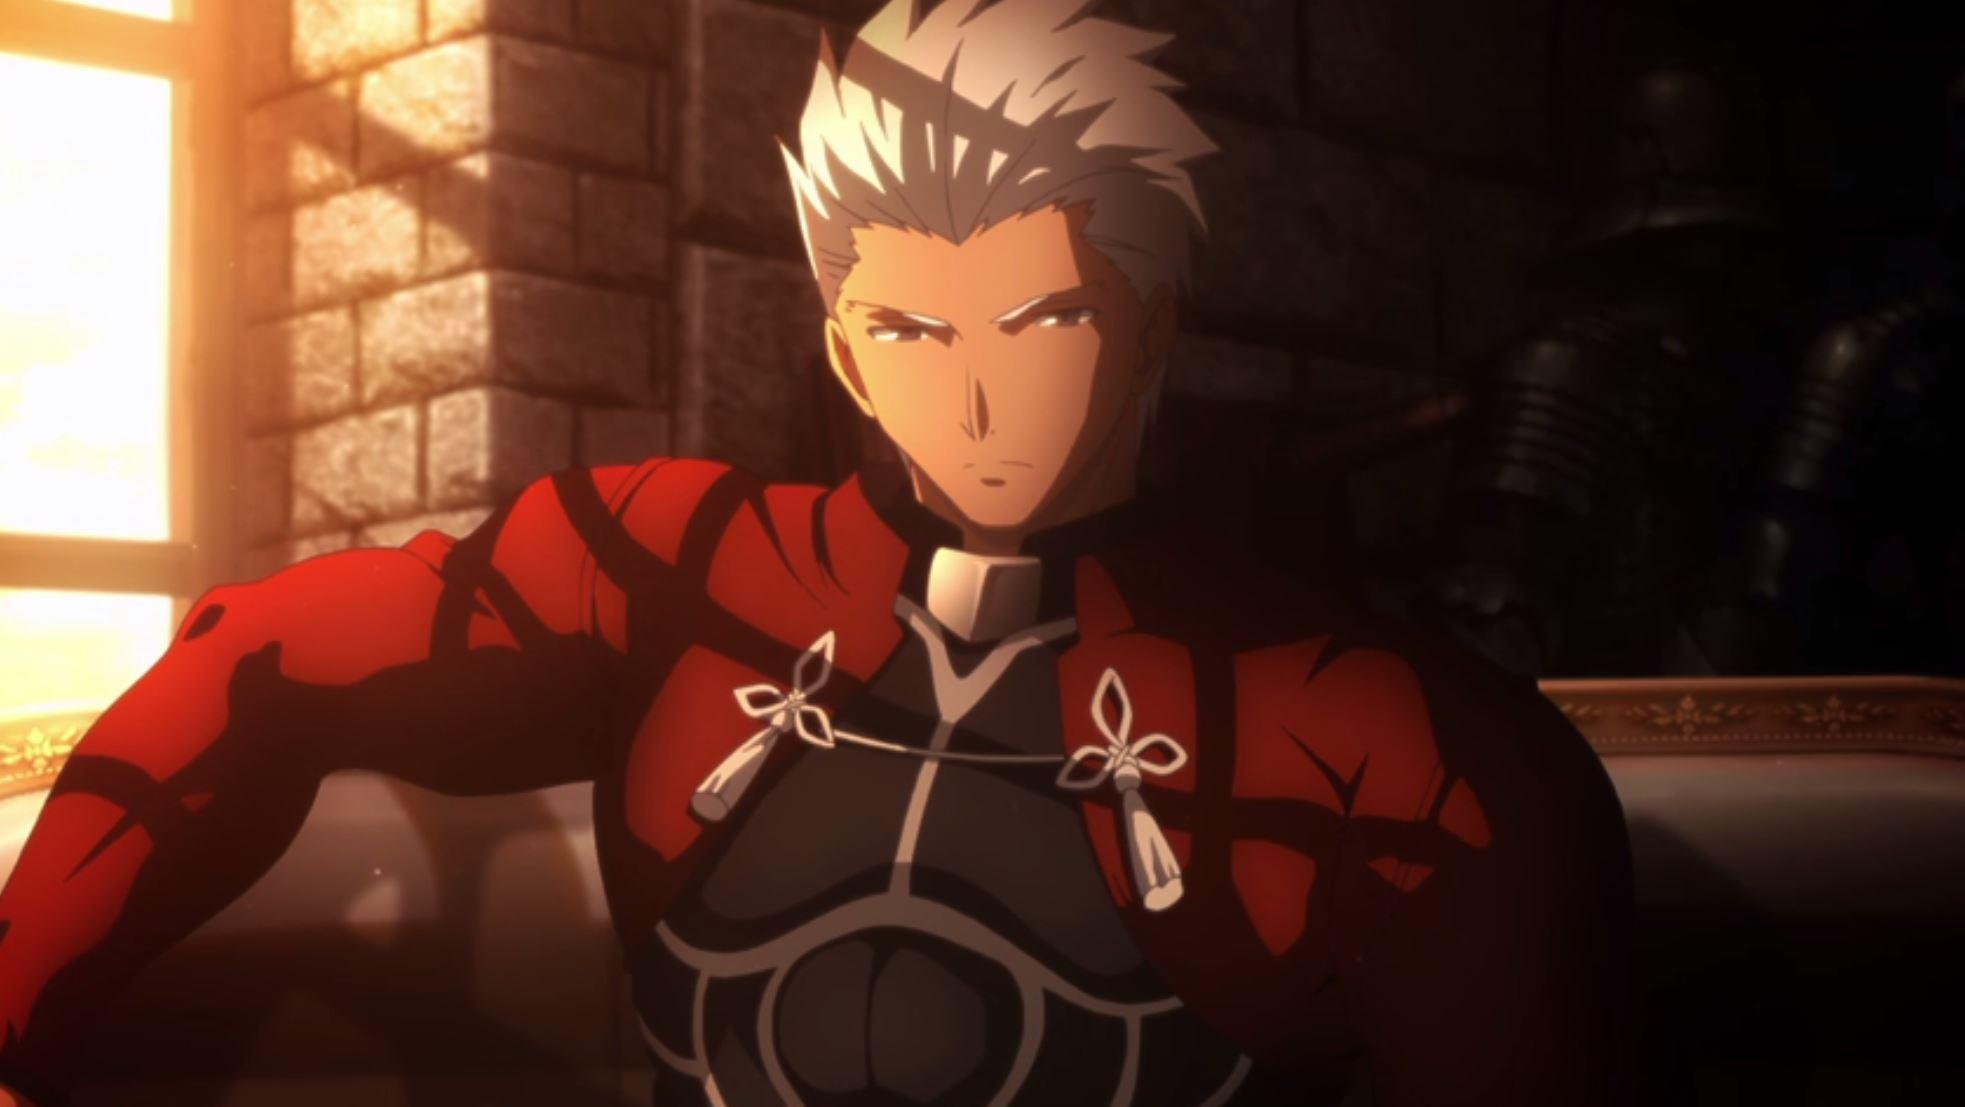 Archer, Fate/stay night